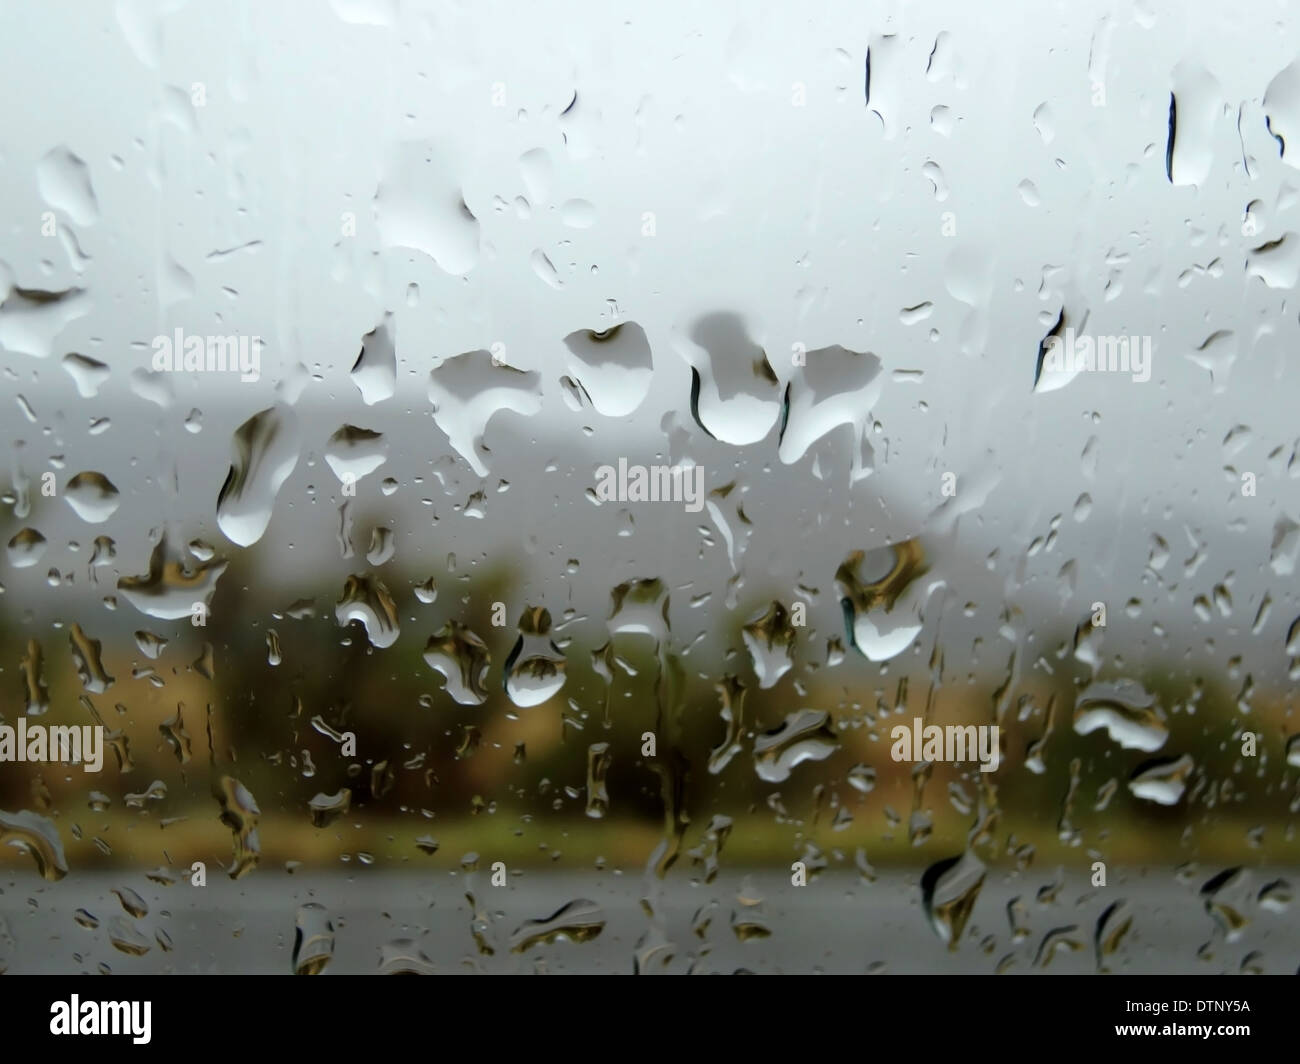 It is raining - Stock Image